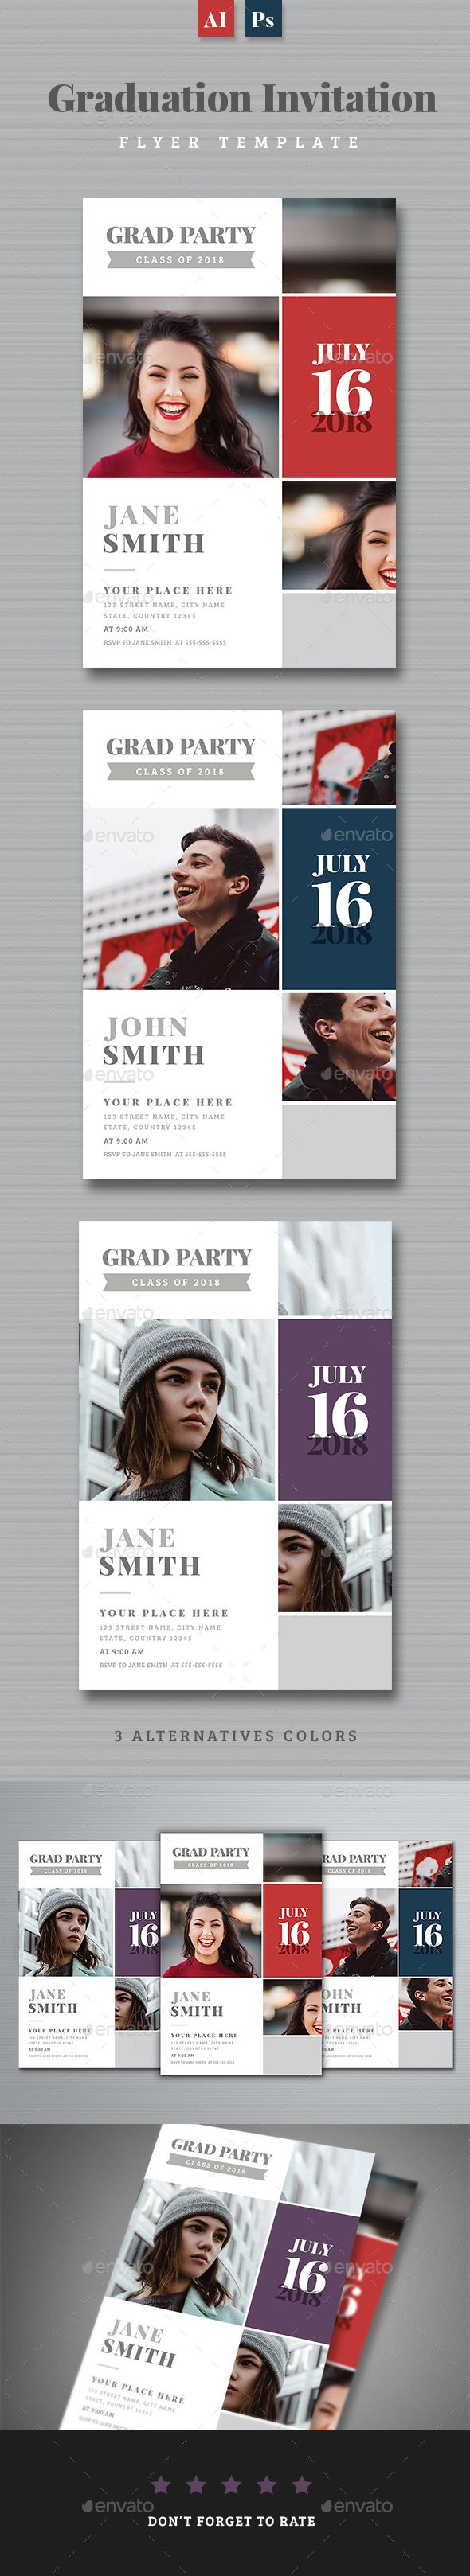 #Graduation Invitation - Invitations #Cards & #Invites